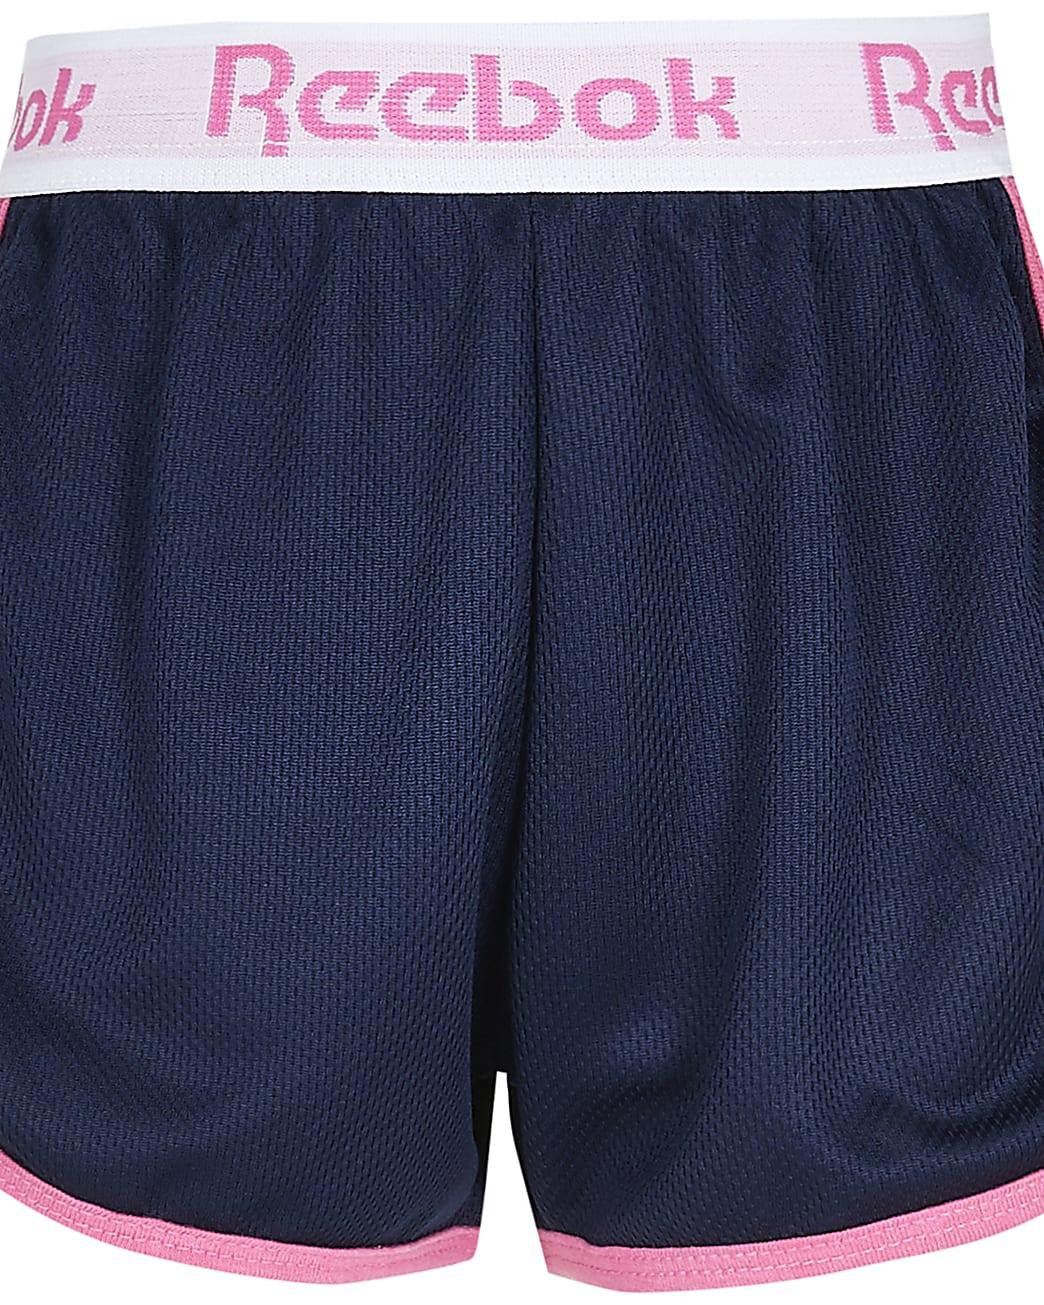 Girls blue Reebok shorts